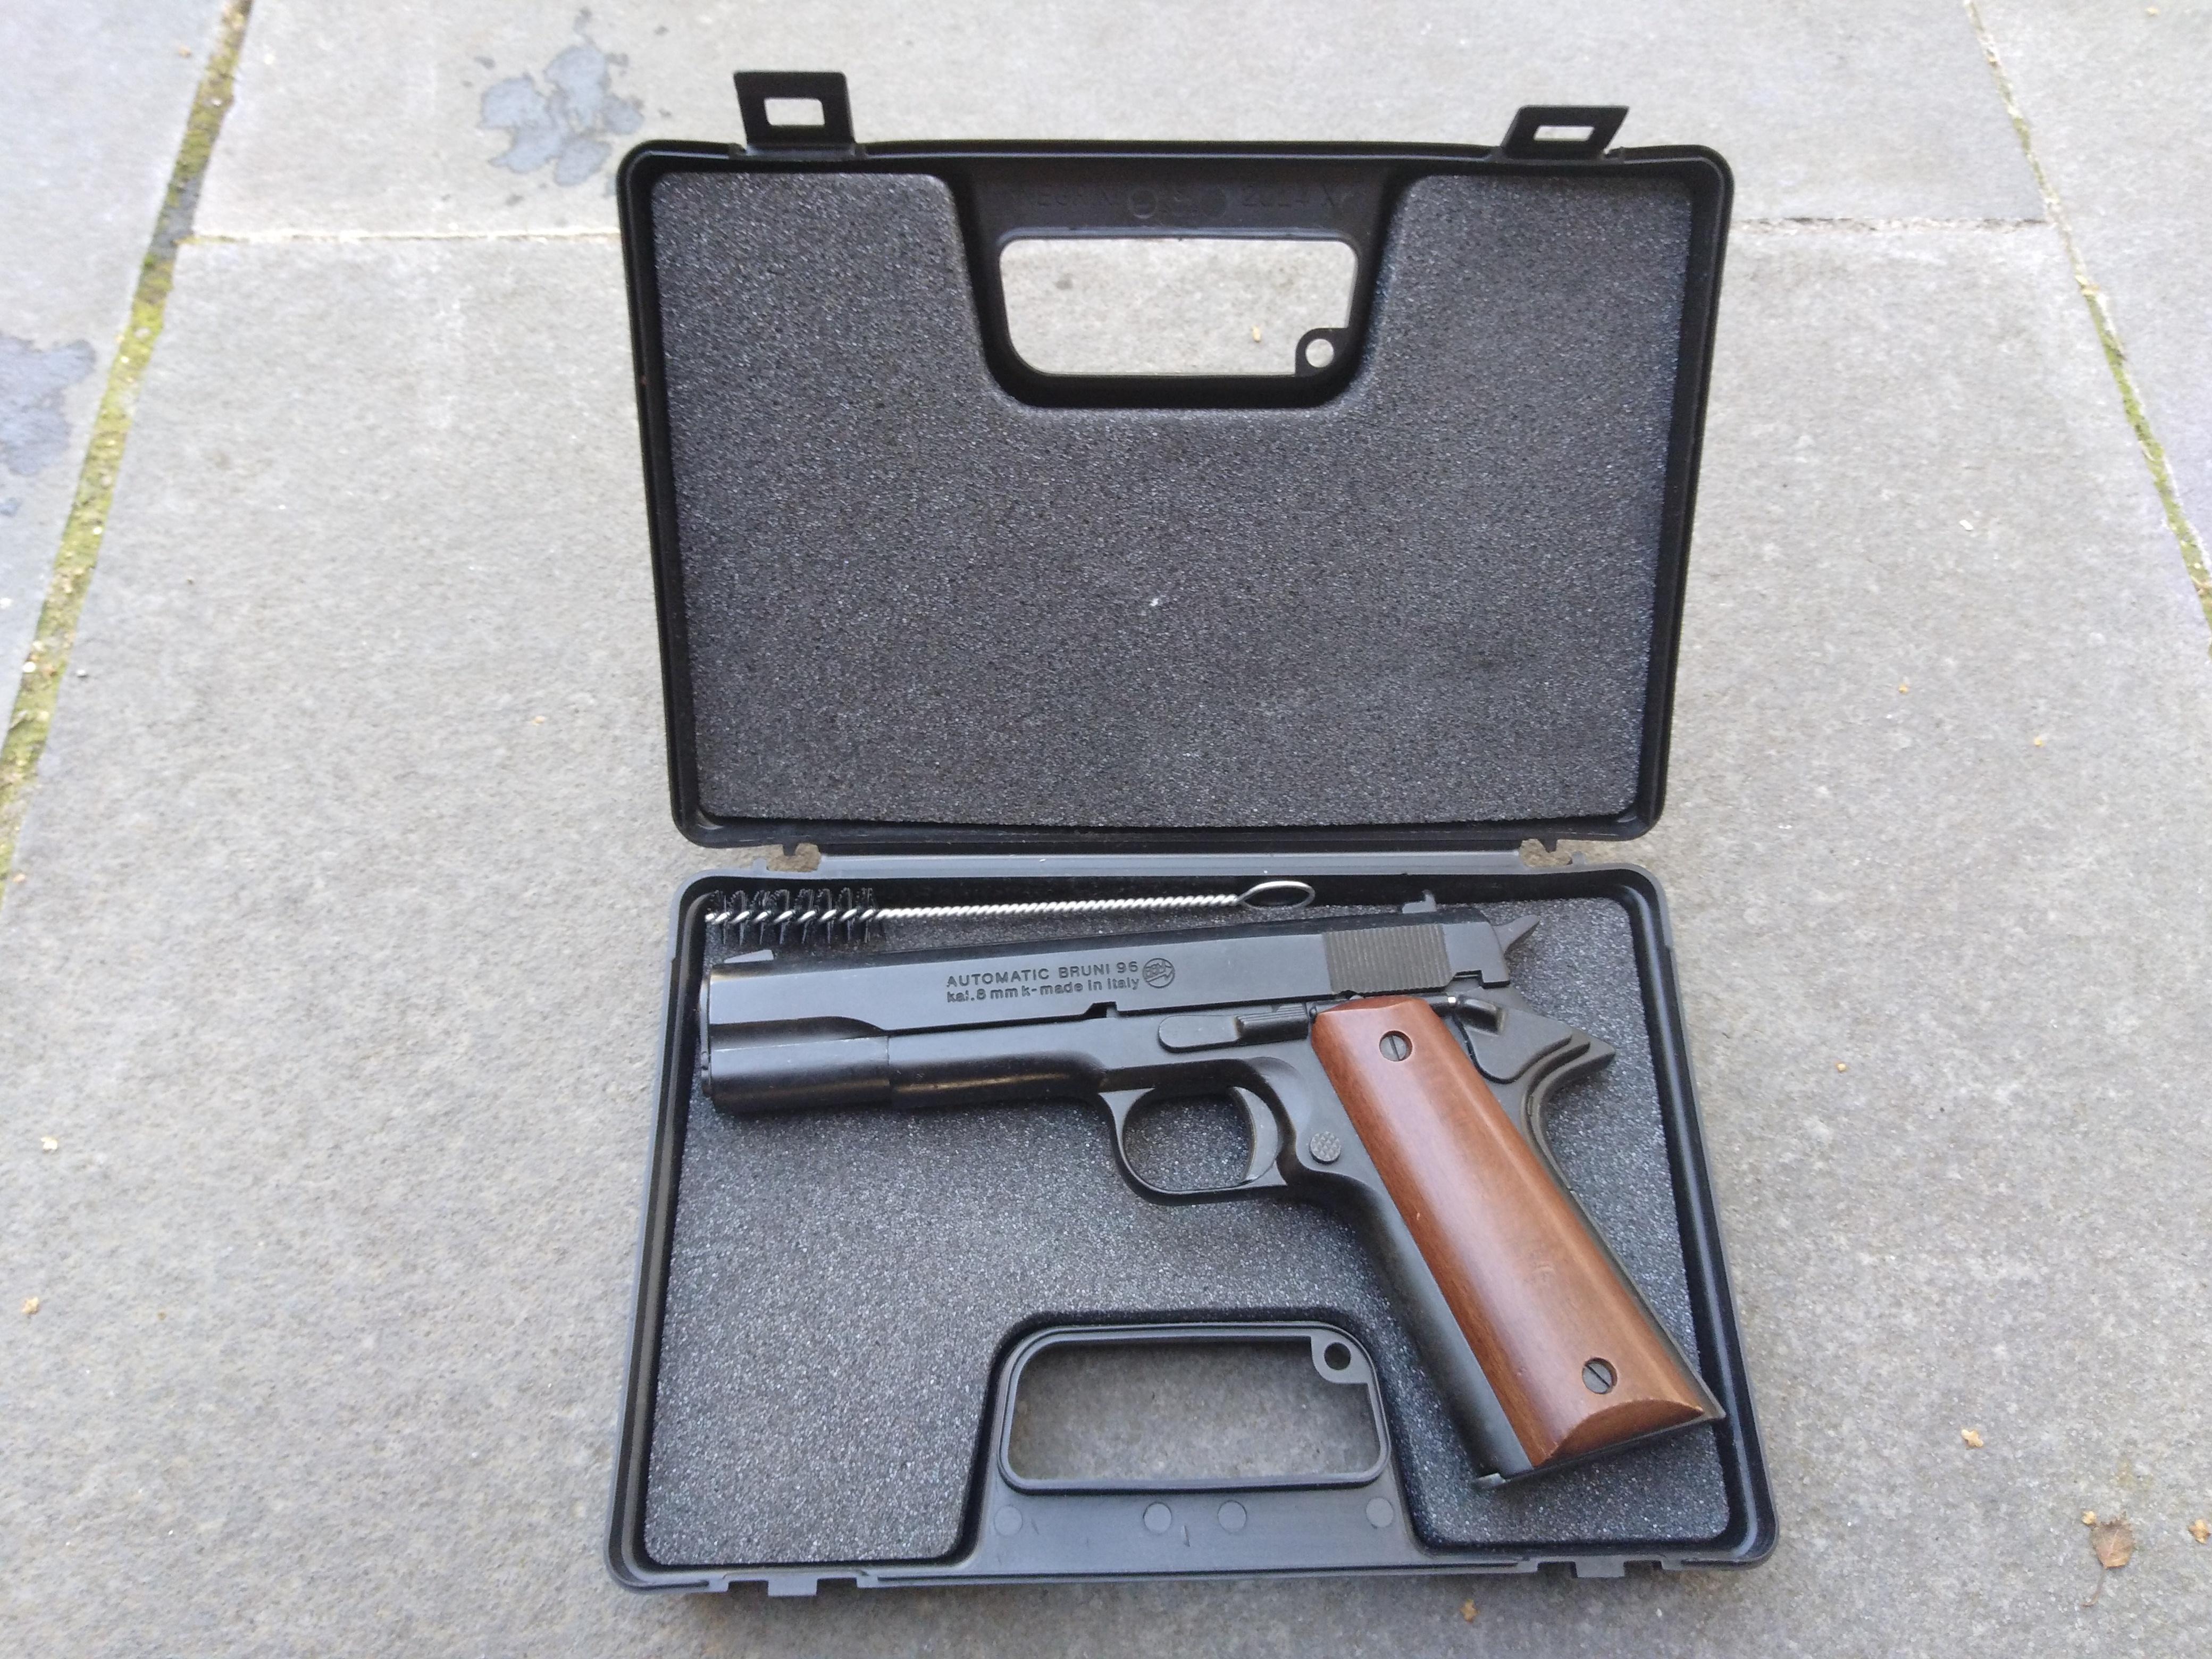 PFCGUK Ltd - Bruni 96 Colt 1911 8mm blank